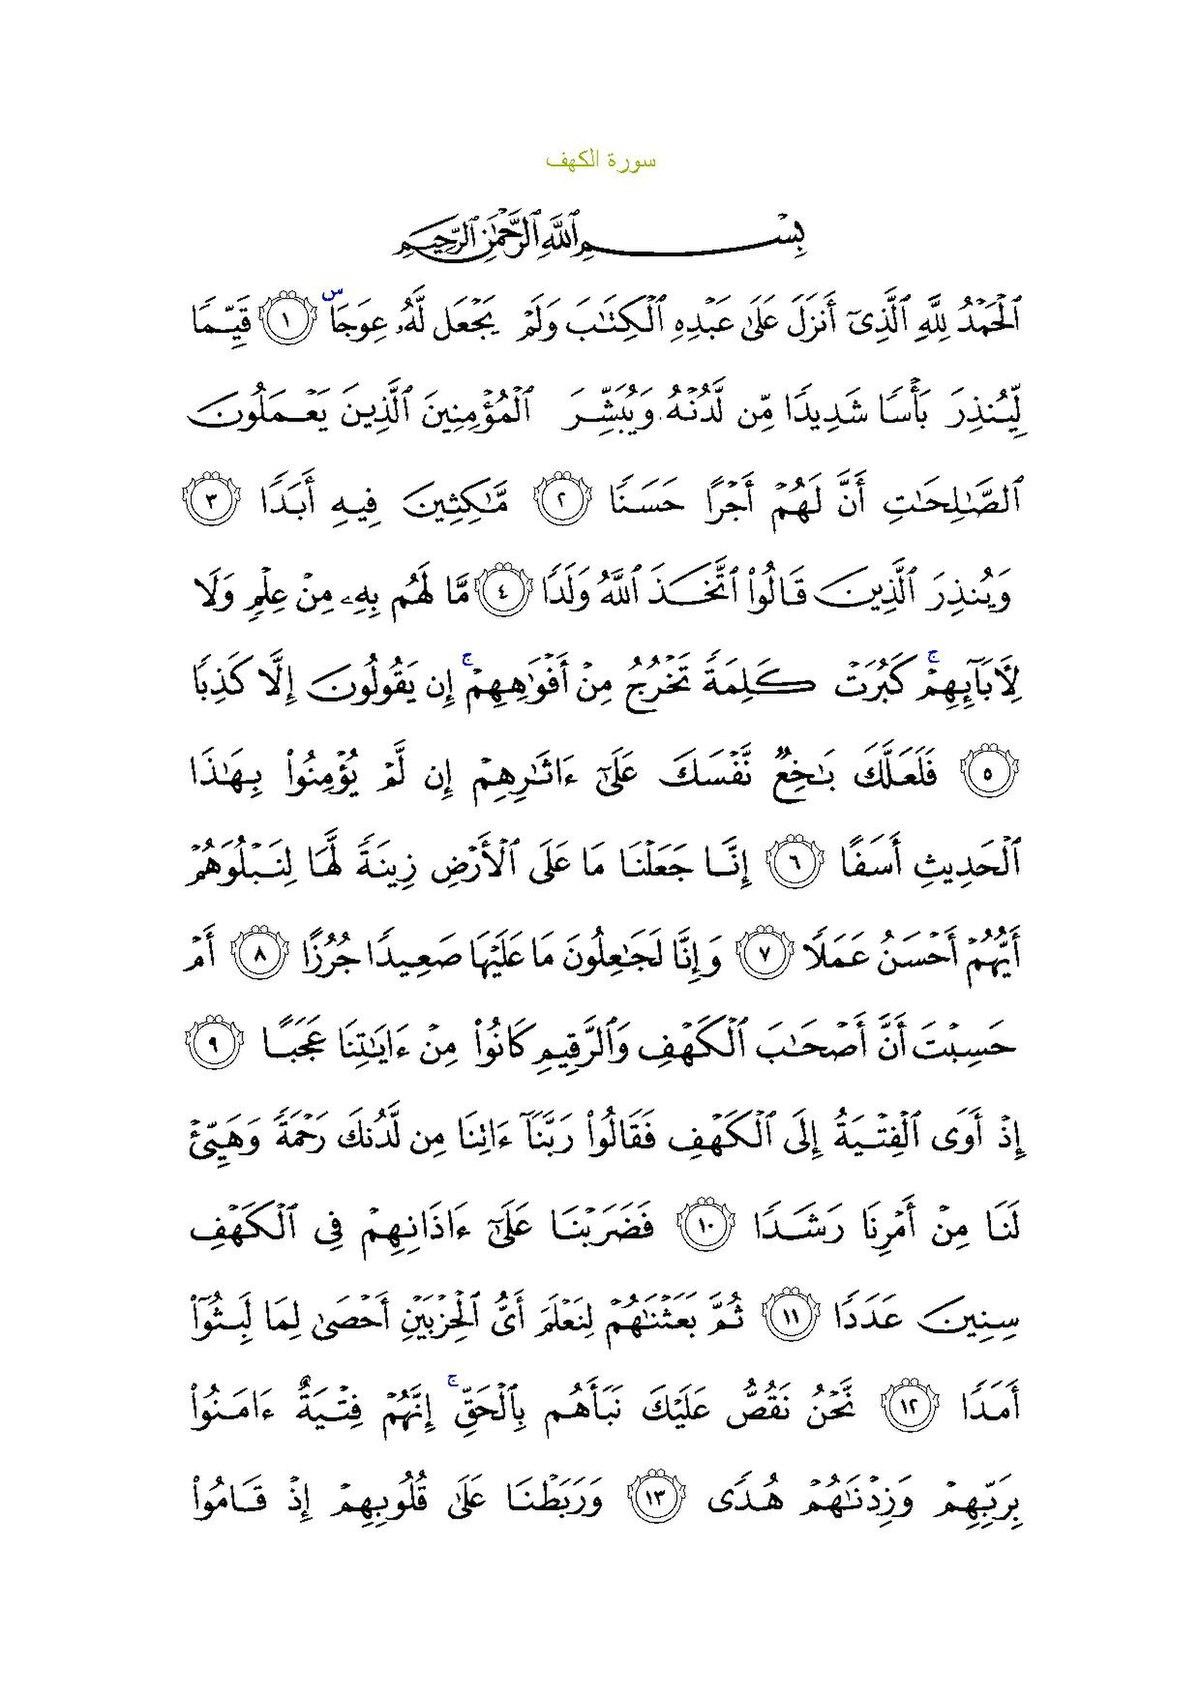 Al Kahfi Berapa Ayat : kahfi, berapa, Surat, Al-Kahfi, Wikipèdia, Bahsa, Acèh,, ènsiklopèdia, Bibeuëh